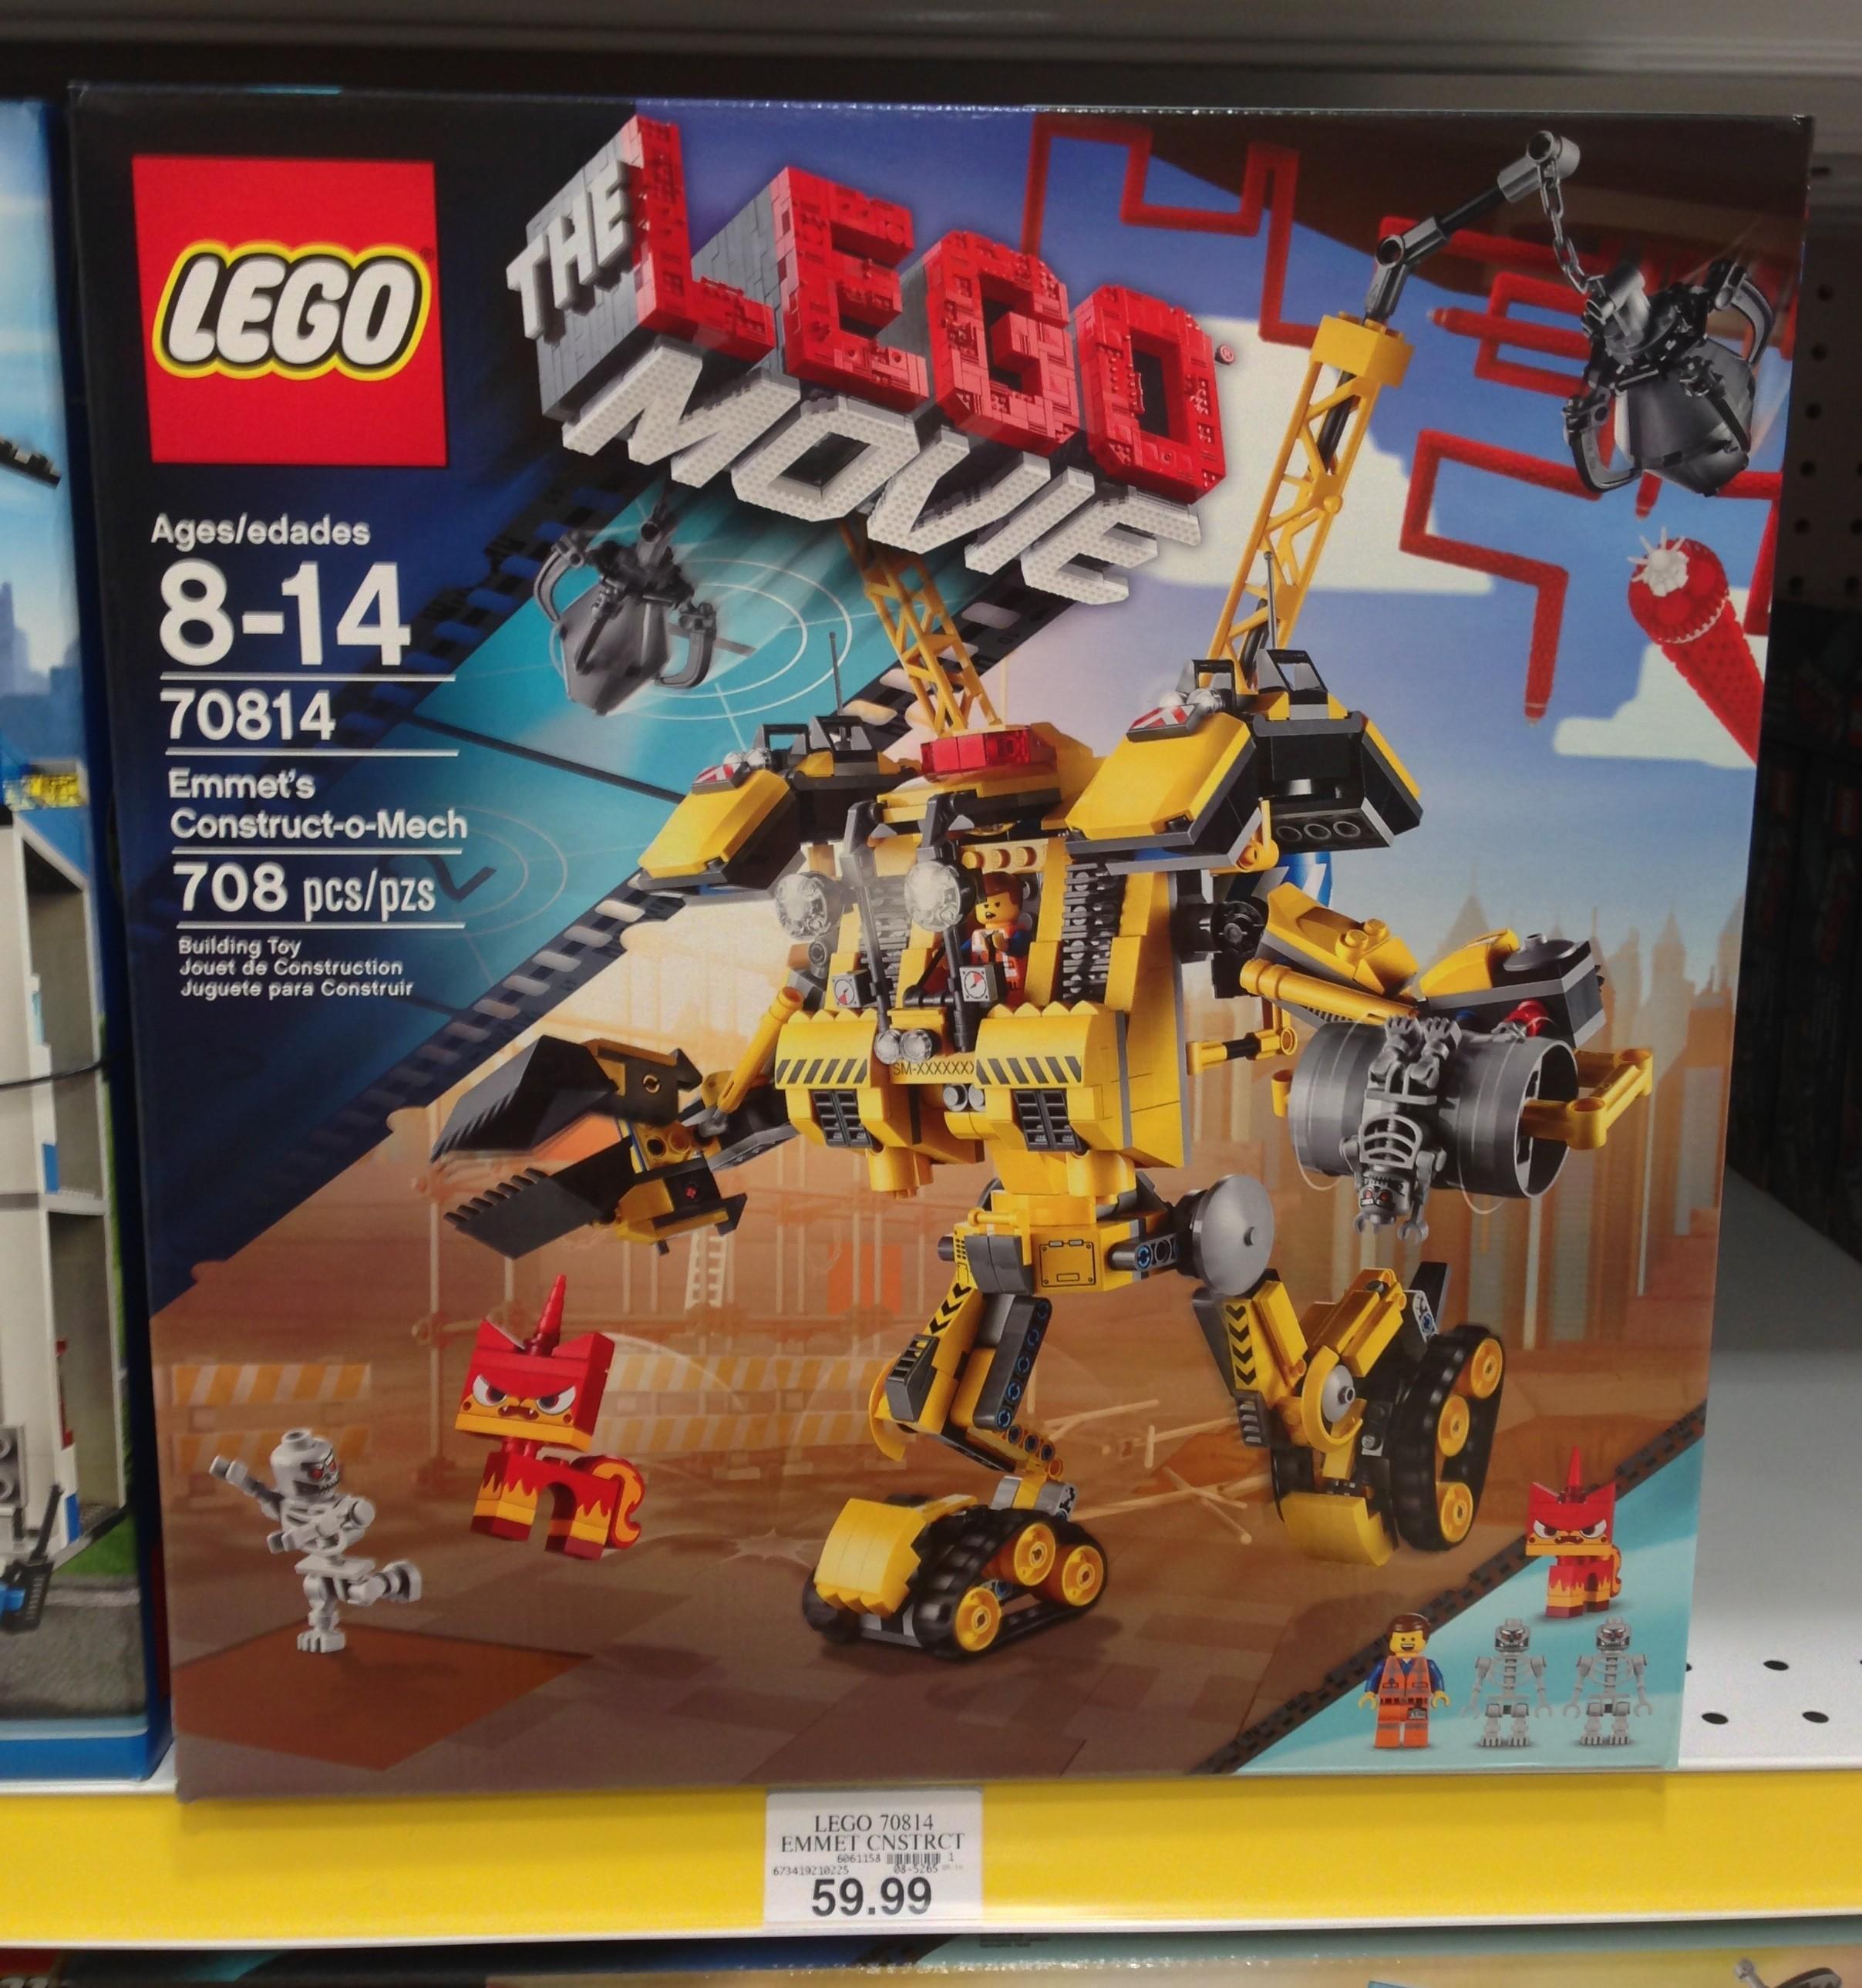 2015 Lego Movie Batman Super Angry Kitty Attack 70817 Bricks And Bloks